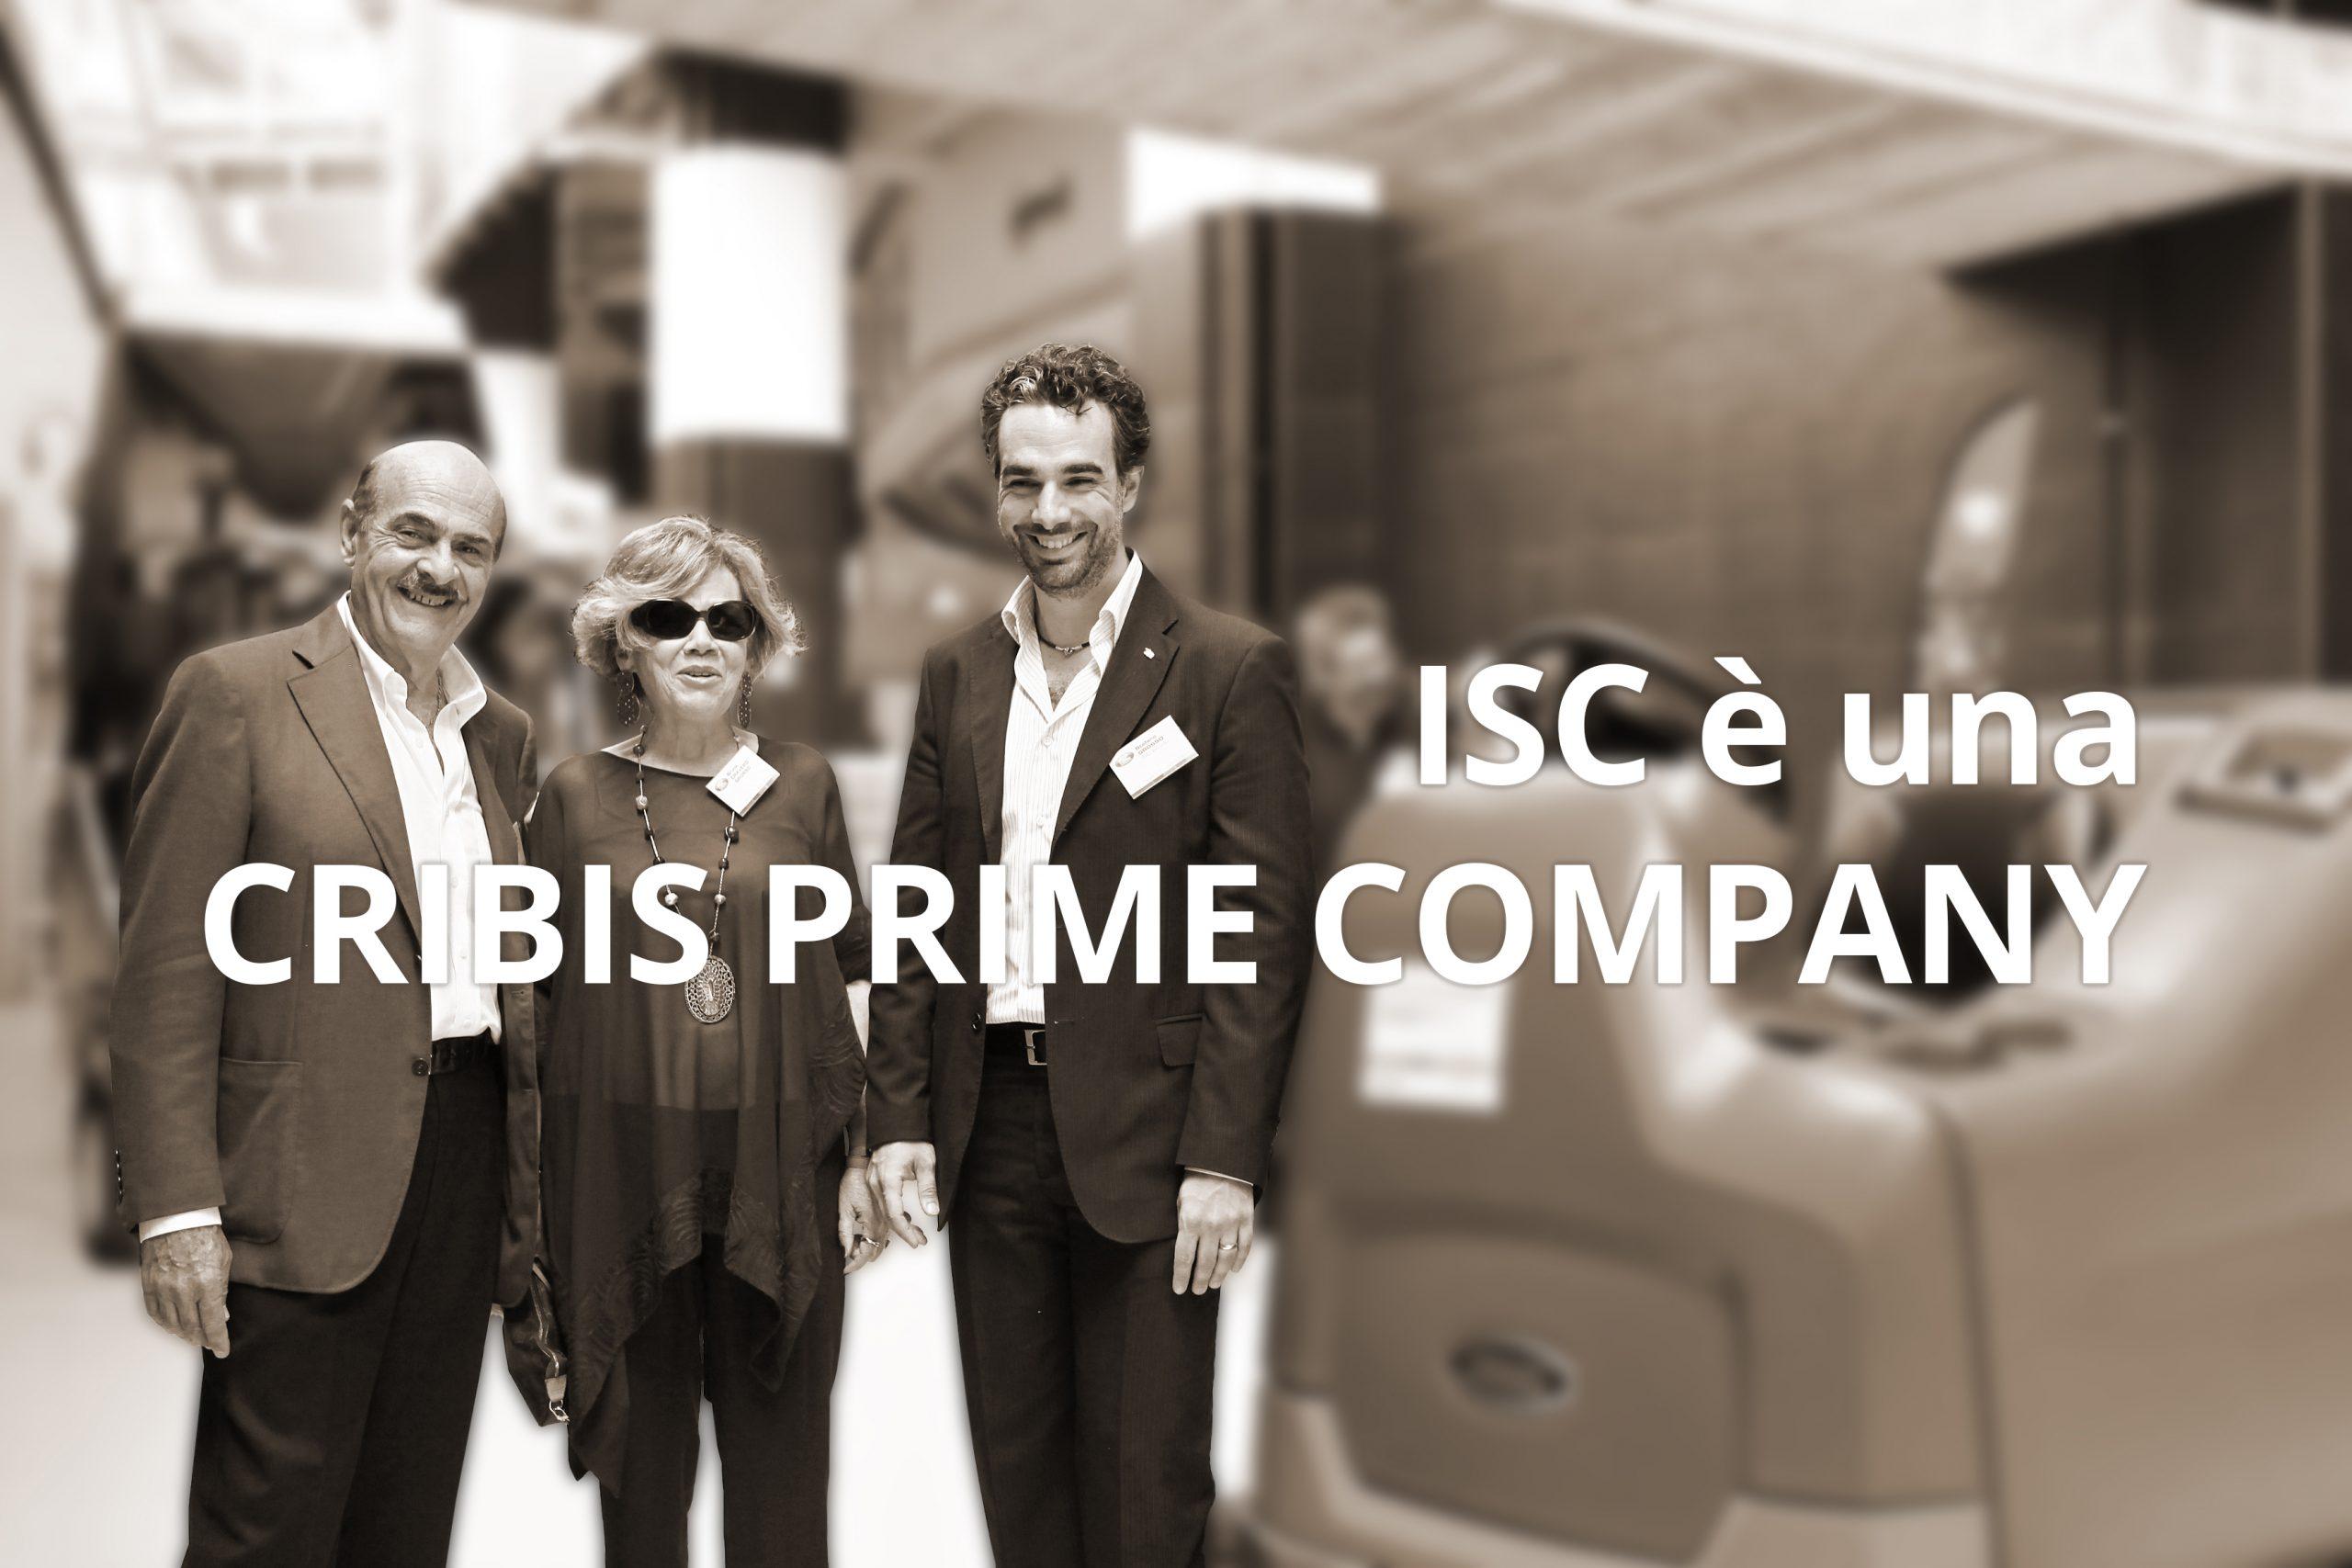 ISC è una CRIBIS PRIME COMPANY